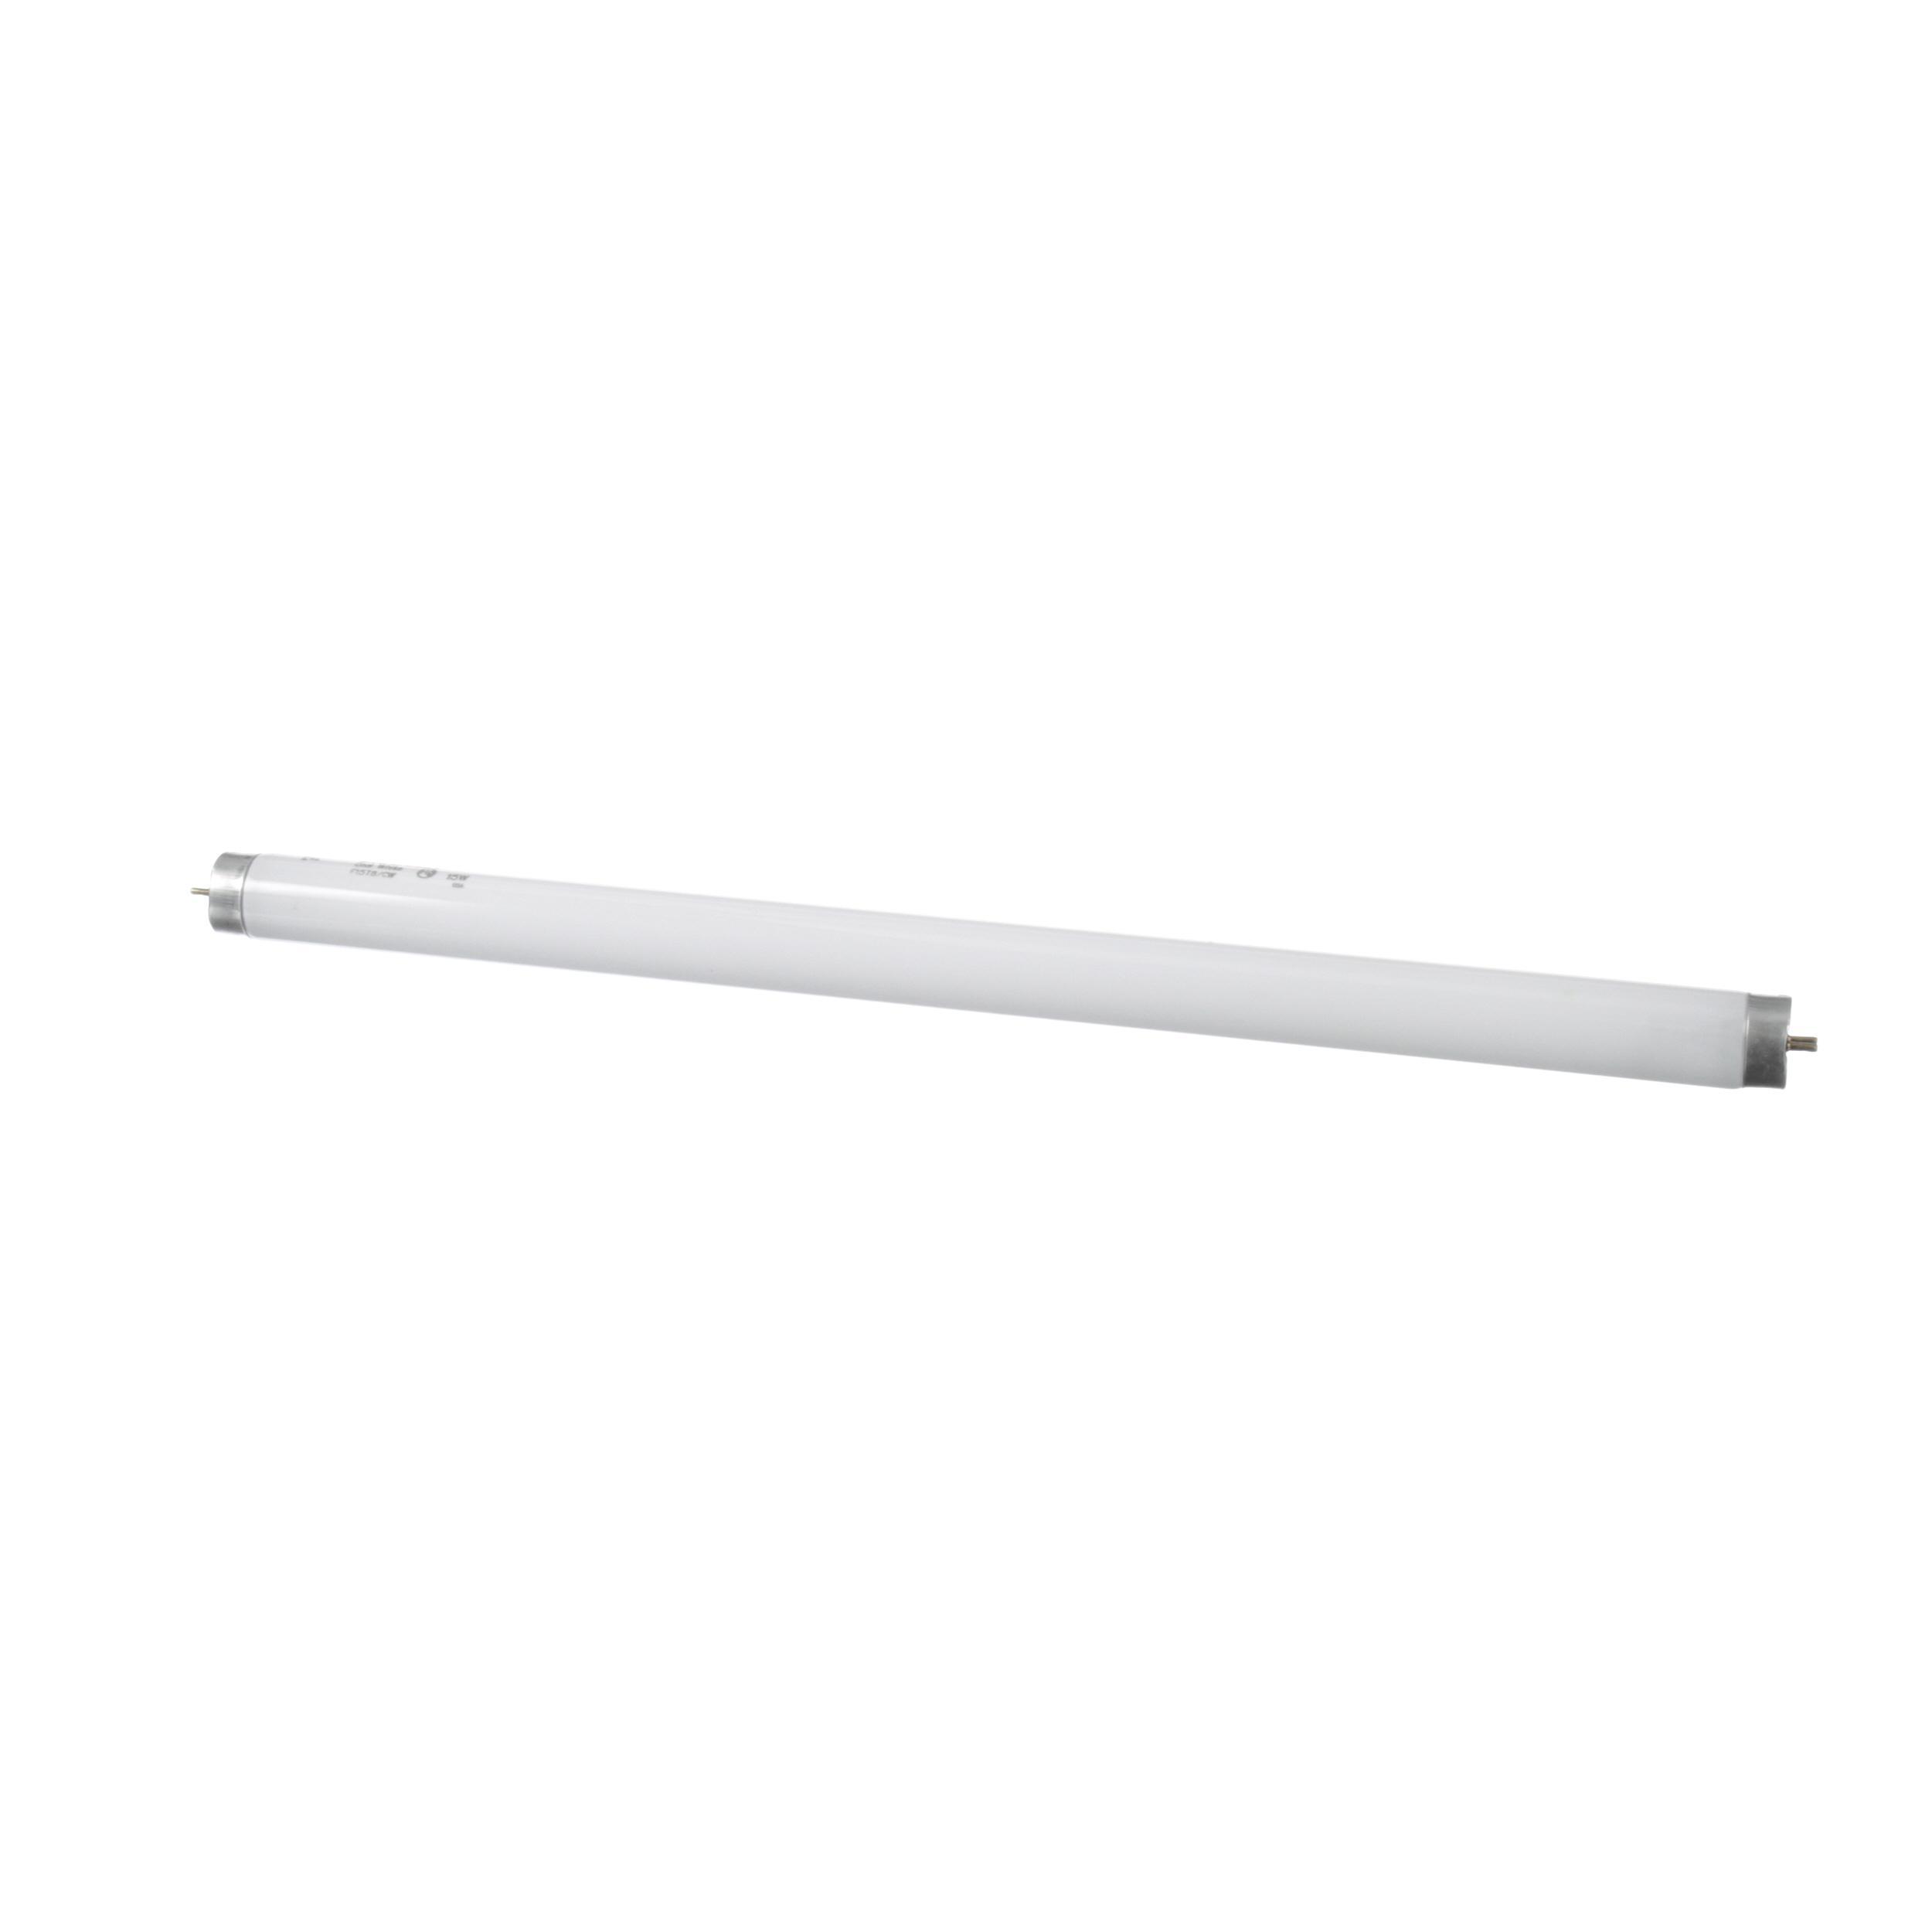 MASTER-BILT PREHEAT FLUORESCENT LAMP 15W